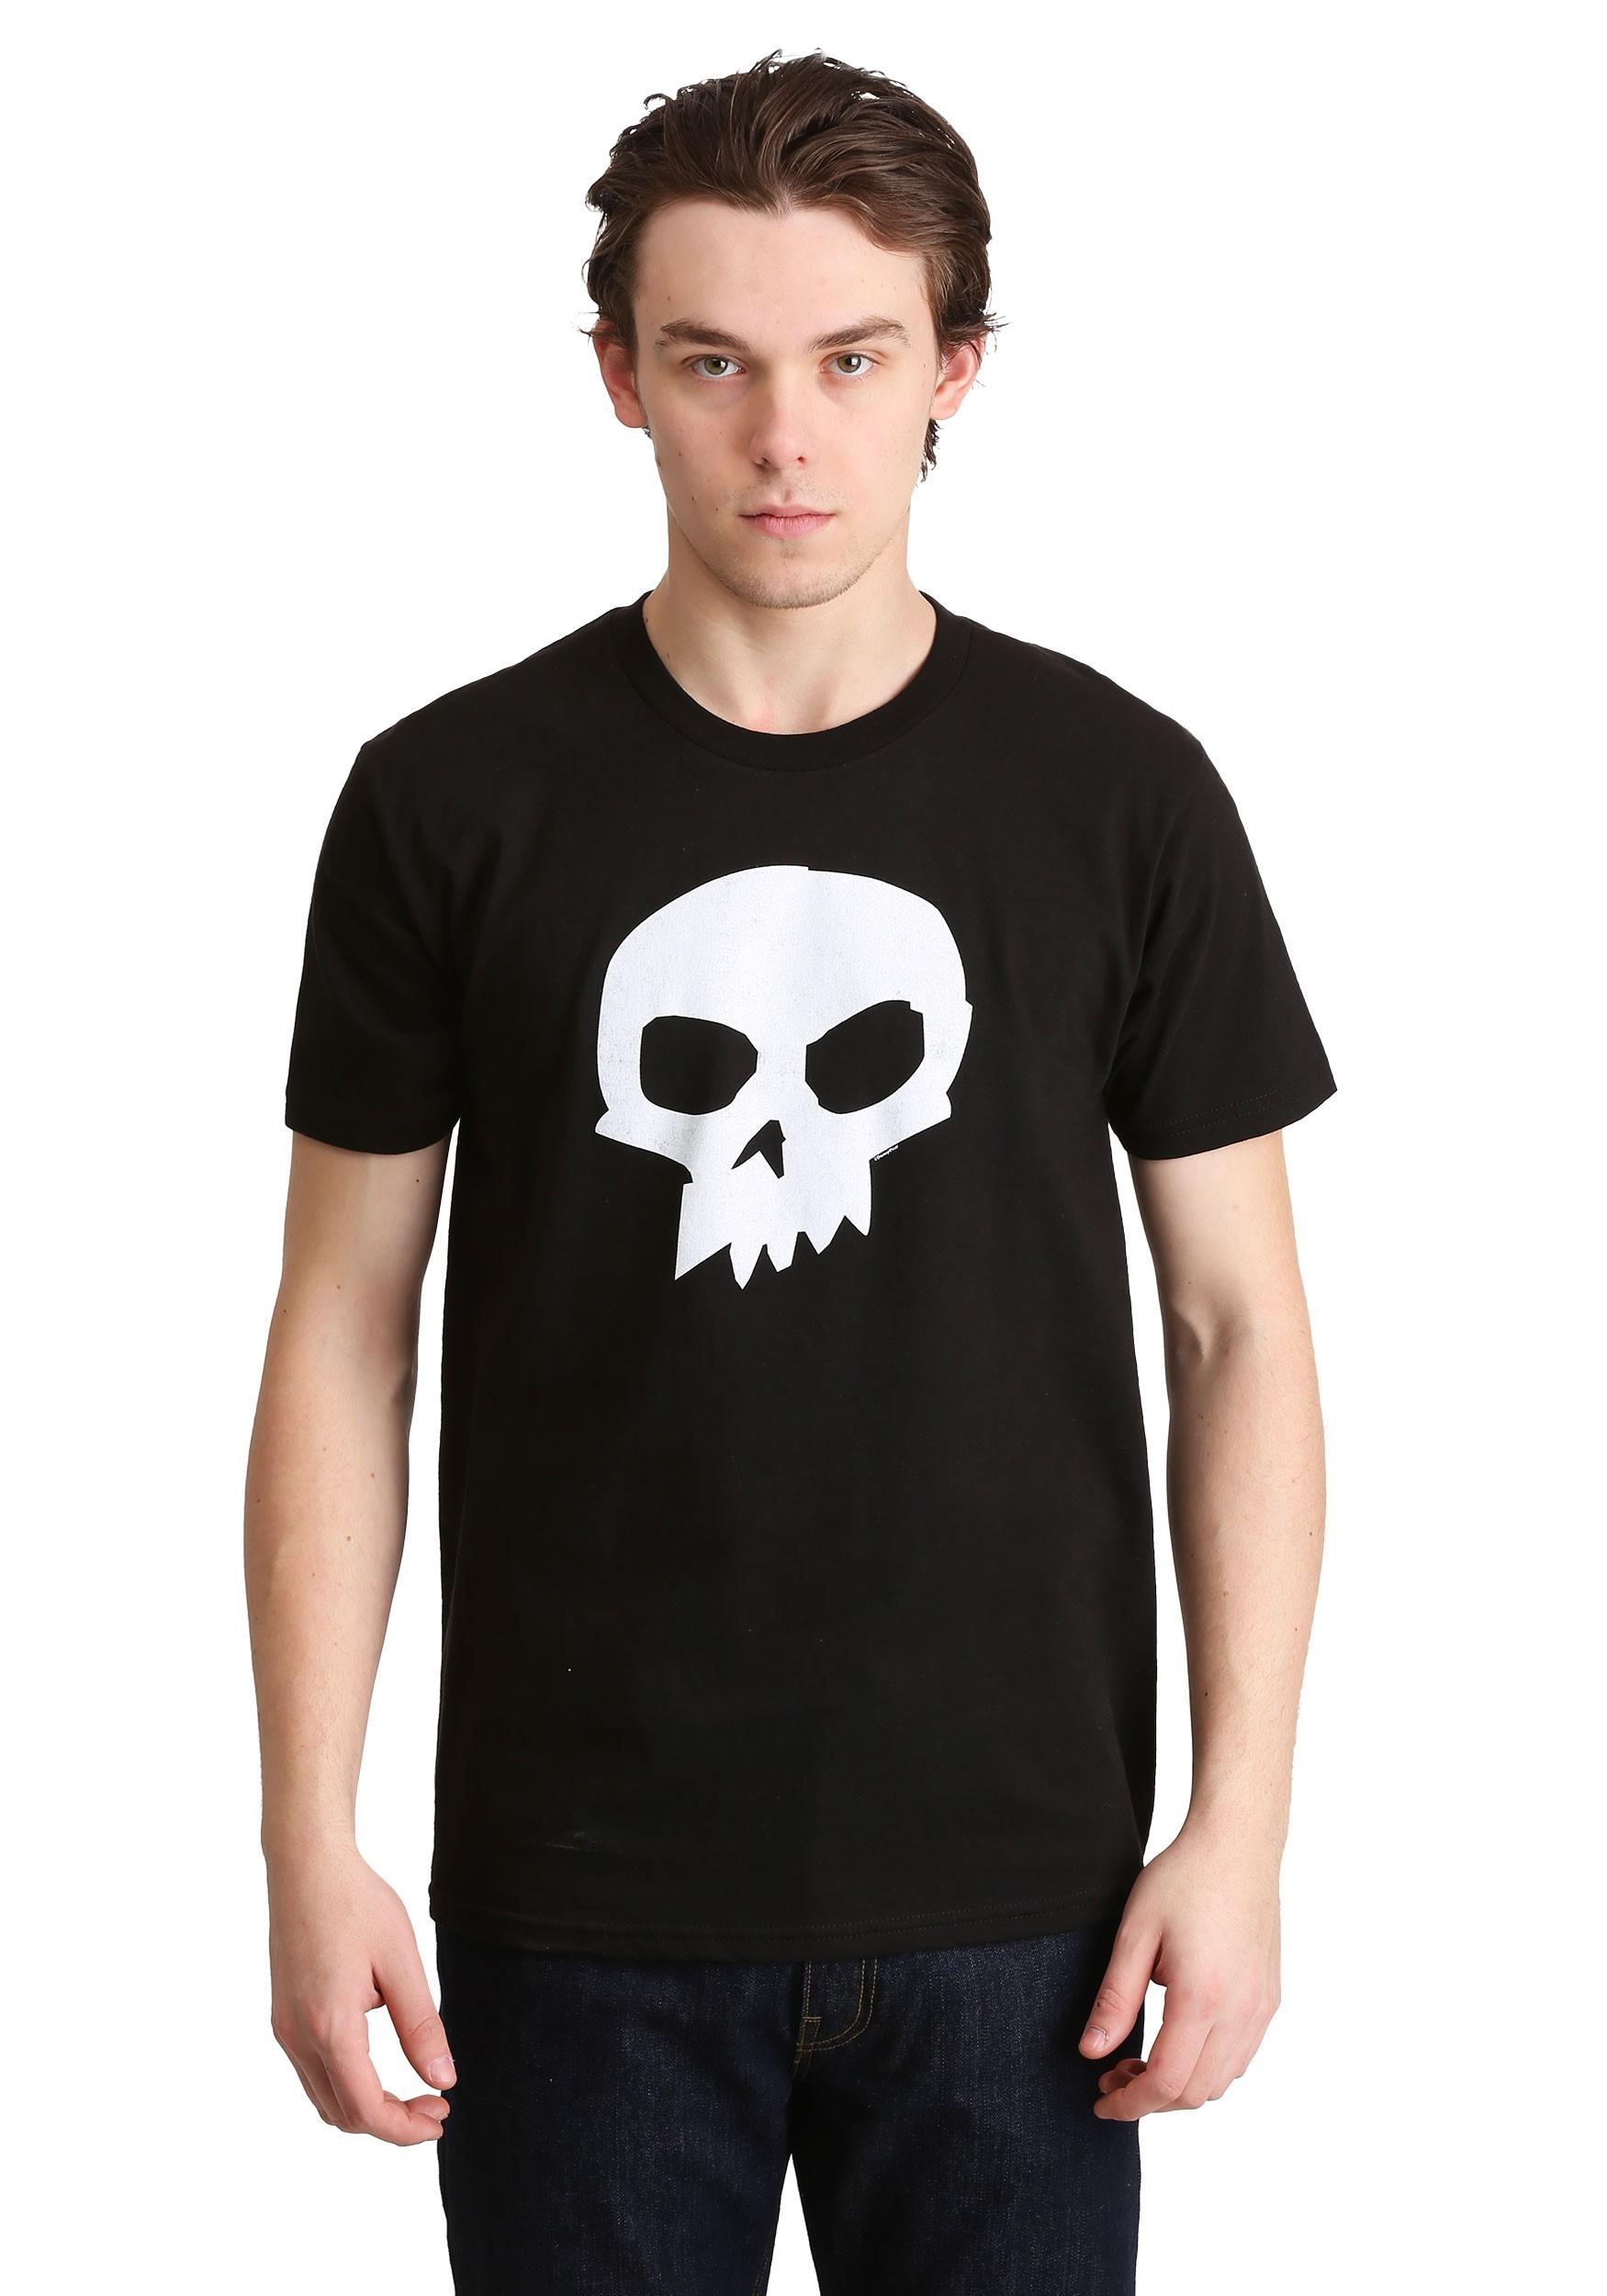 Toy Story Sid Black Skull Tshirt